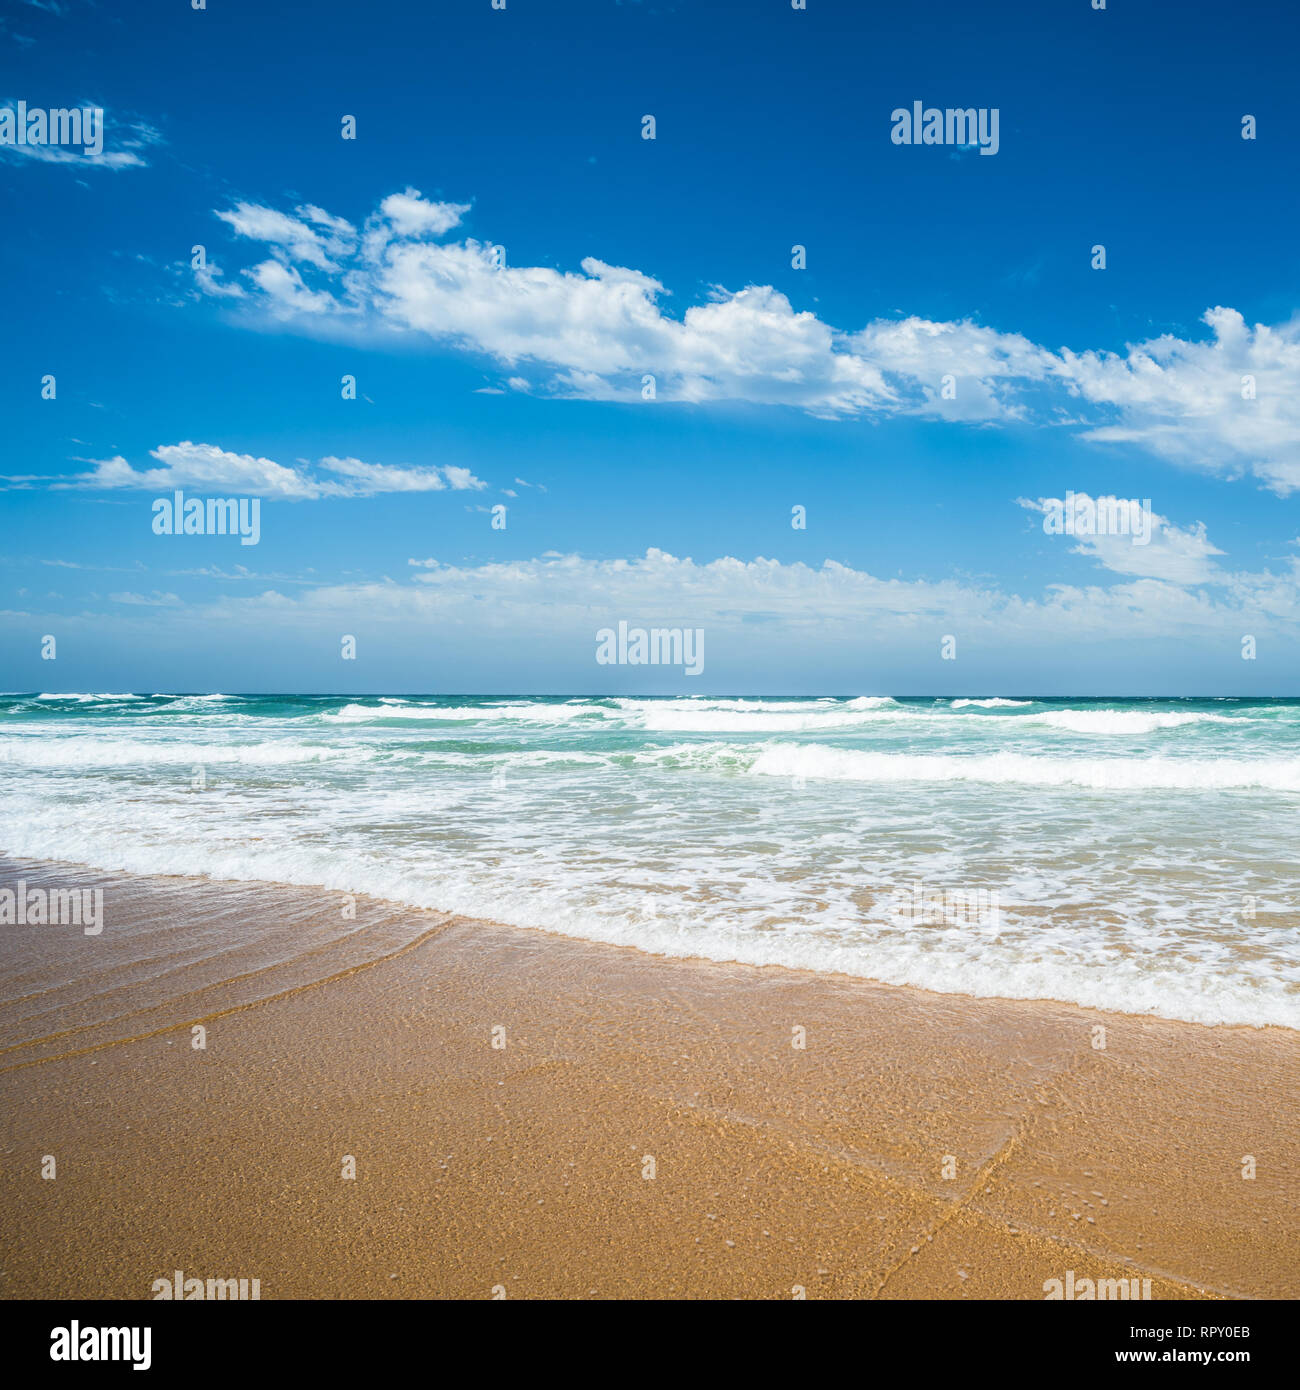 Yellow sand beach, sea and deep blue sky. - Stock Image